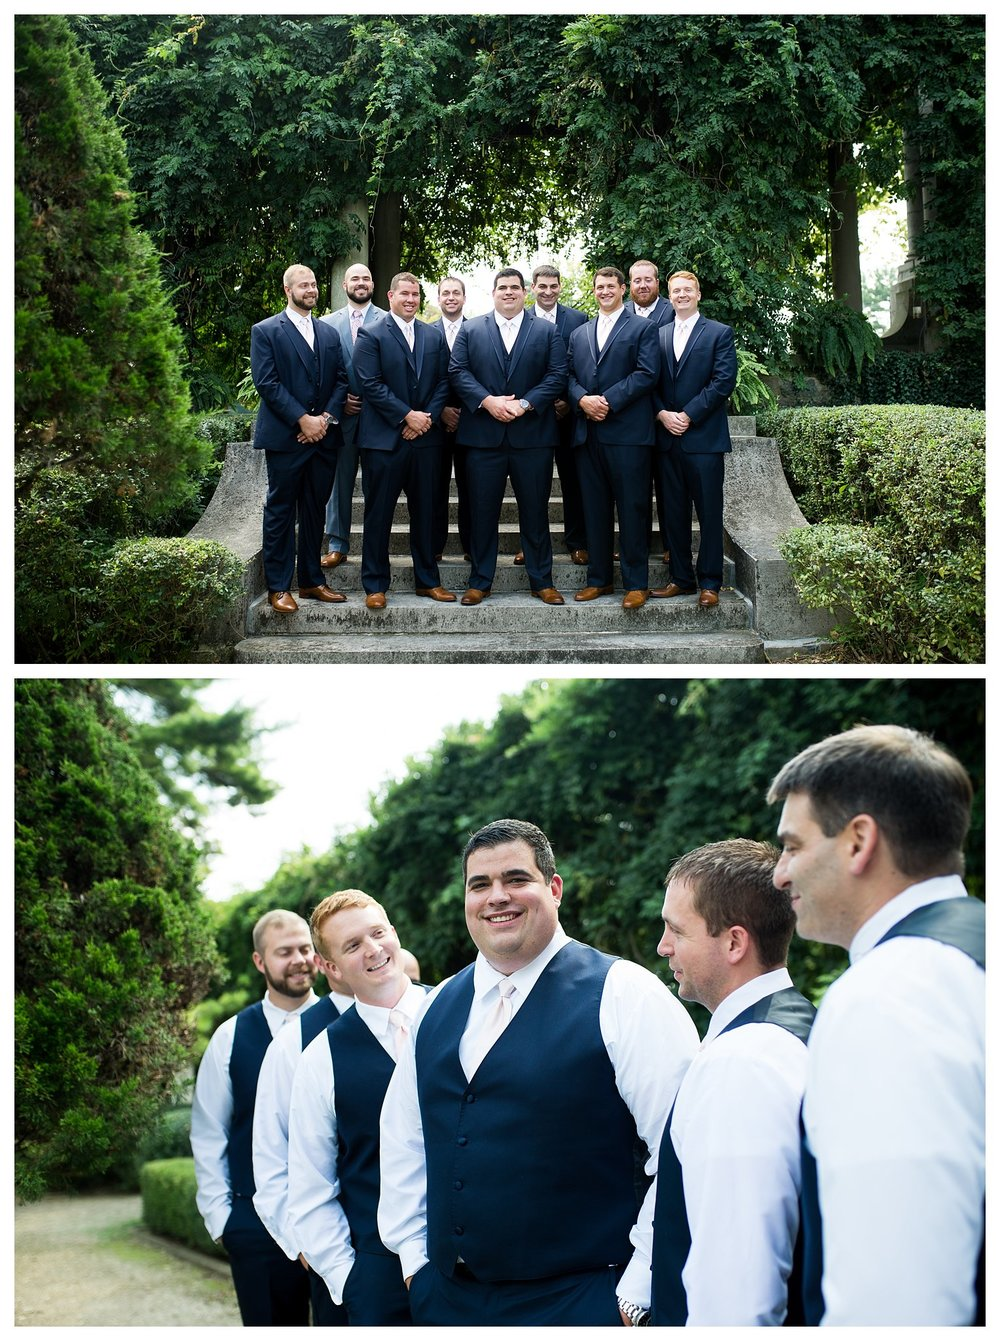 laurel-court-wedding-everleigh-photography-cincinnati-wedding-photographer-northern-ky-wedding-photographer-17